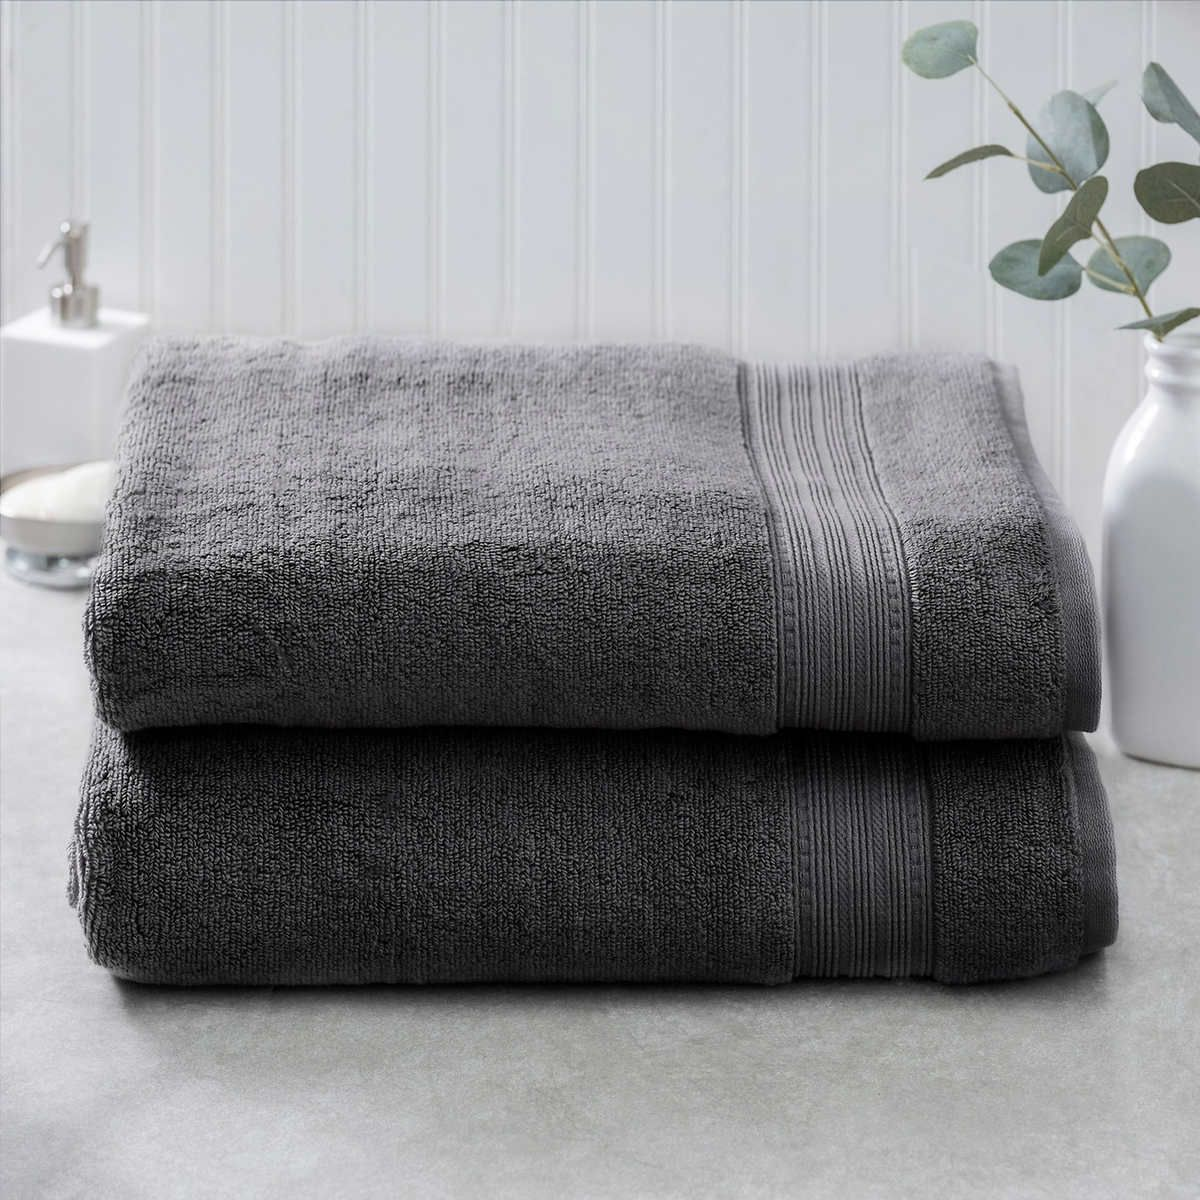 Charisma 100 Hygrocotton 2 Piece Bath Sheet Set Bath Sheets